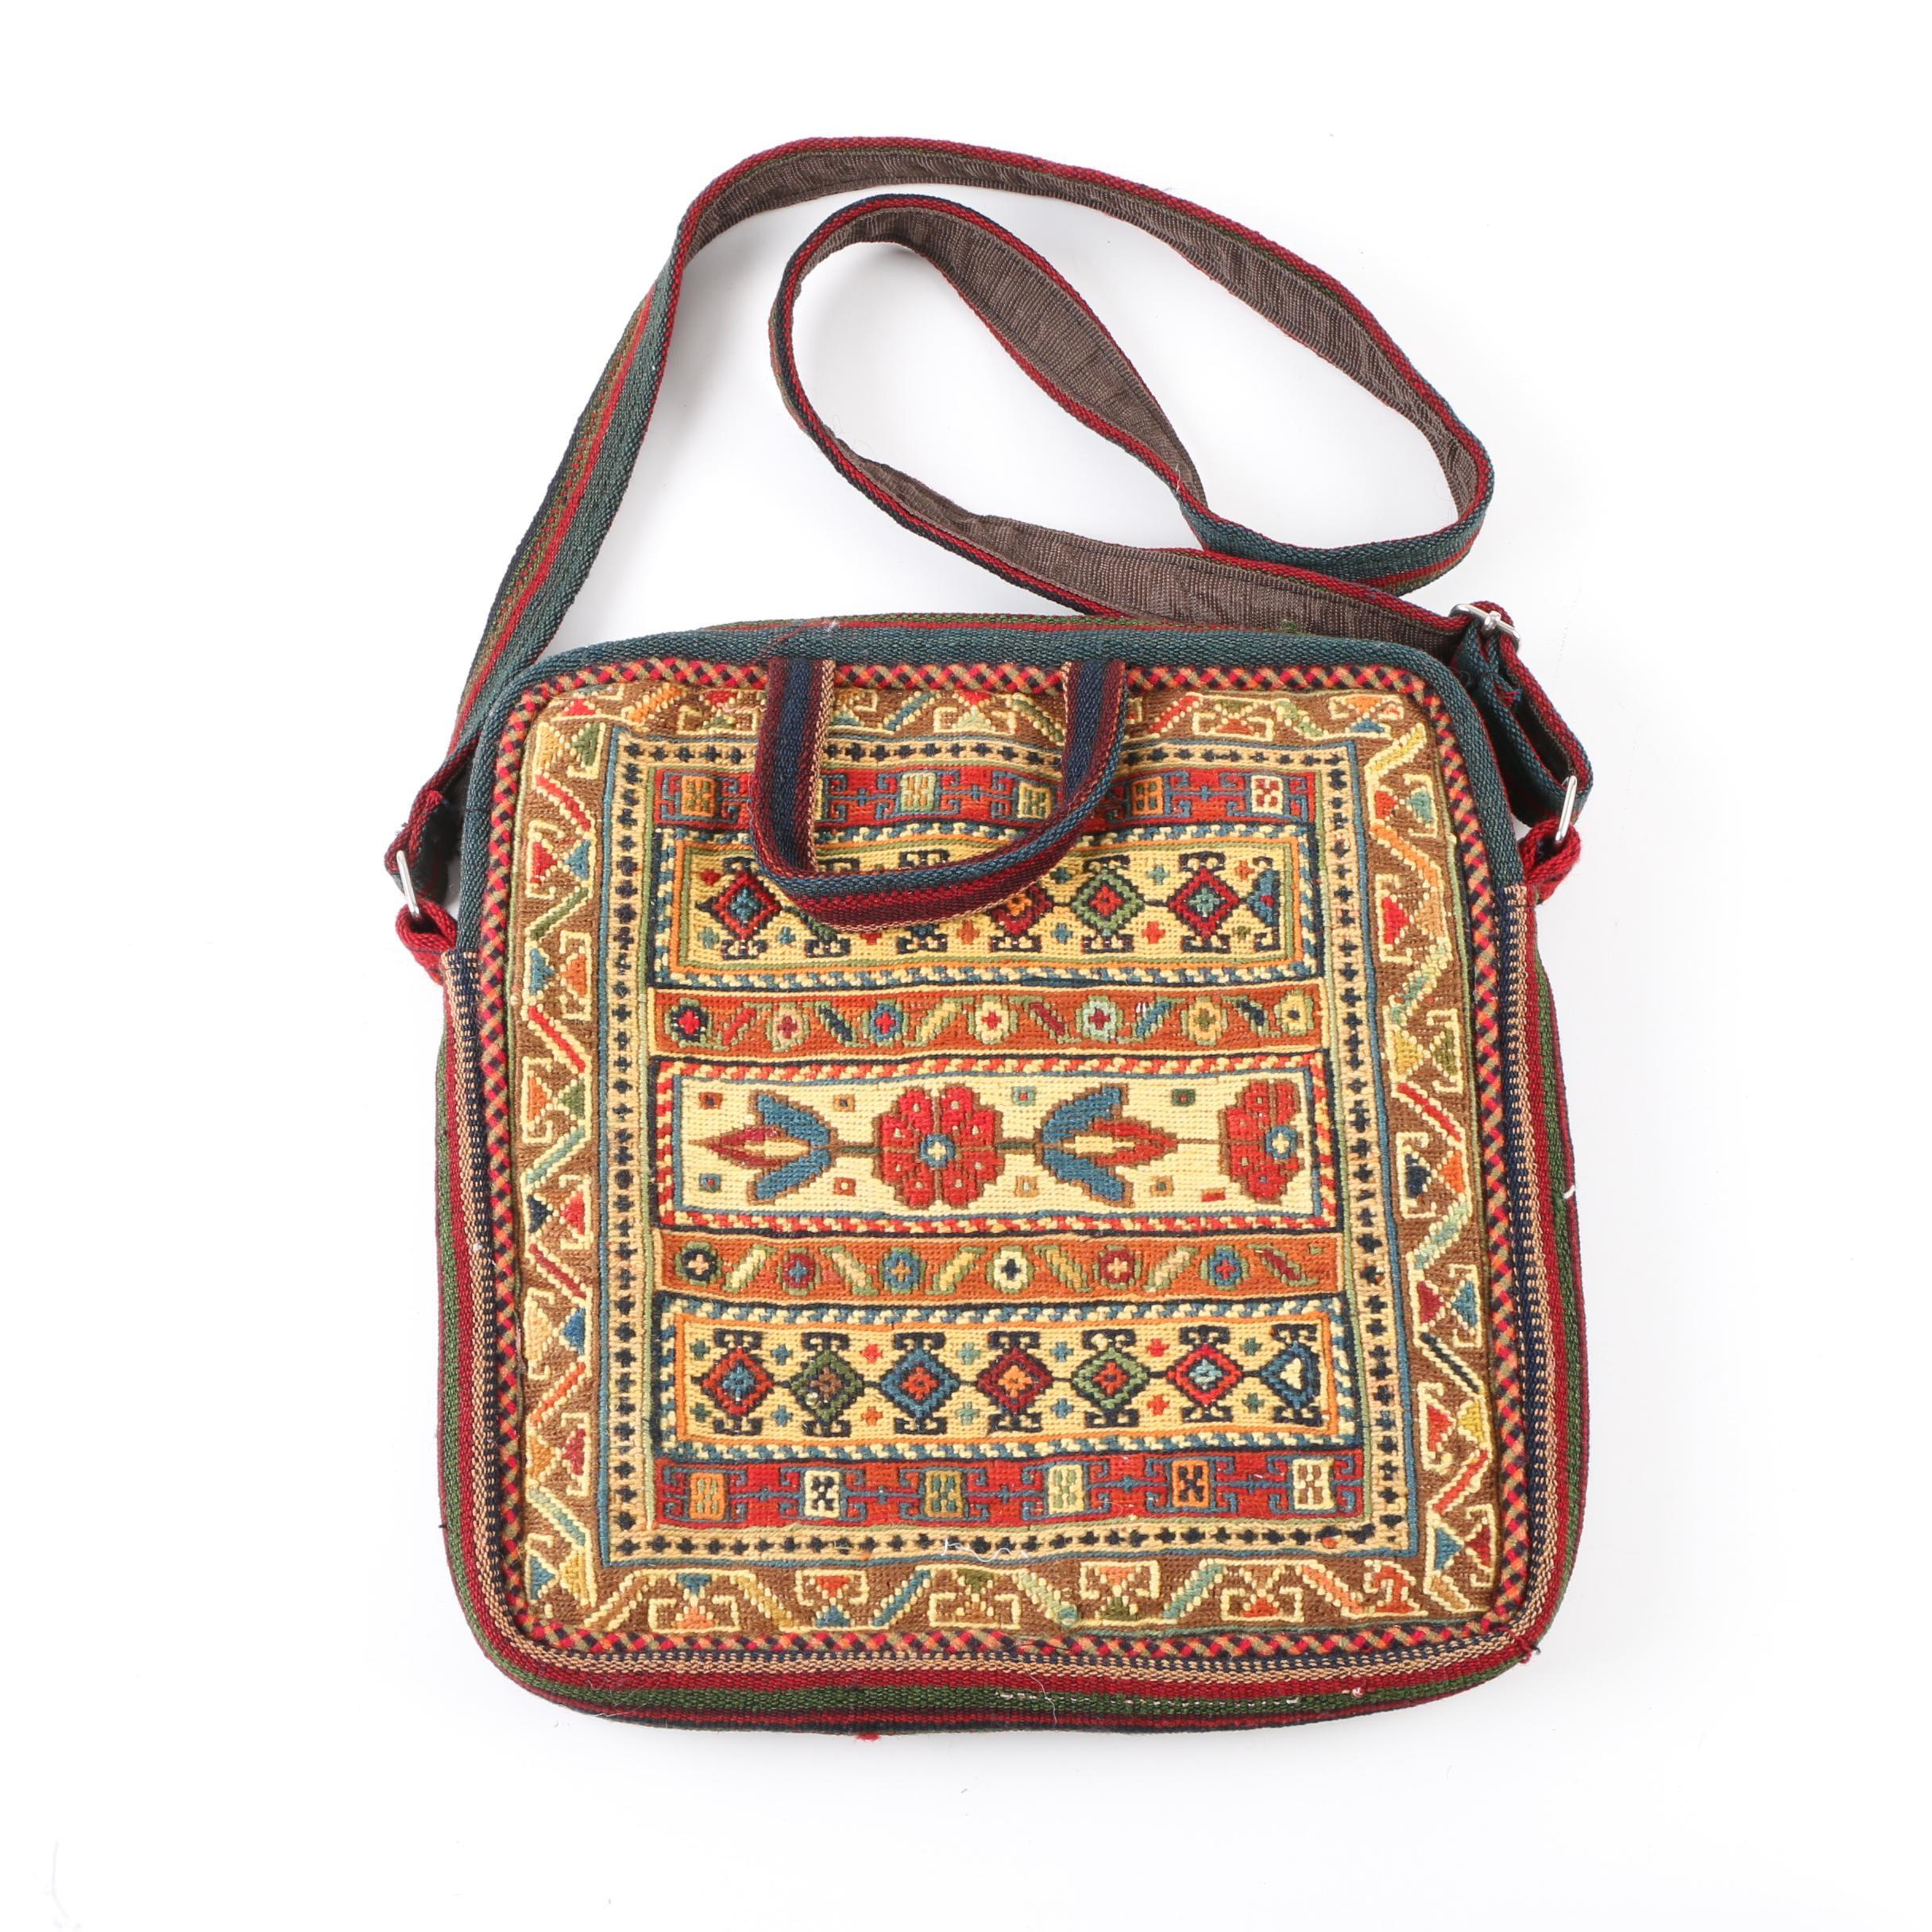 Southwestern Style Woven Messenger Bag